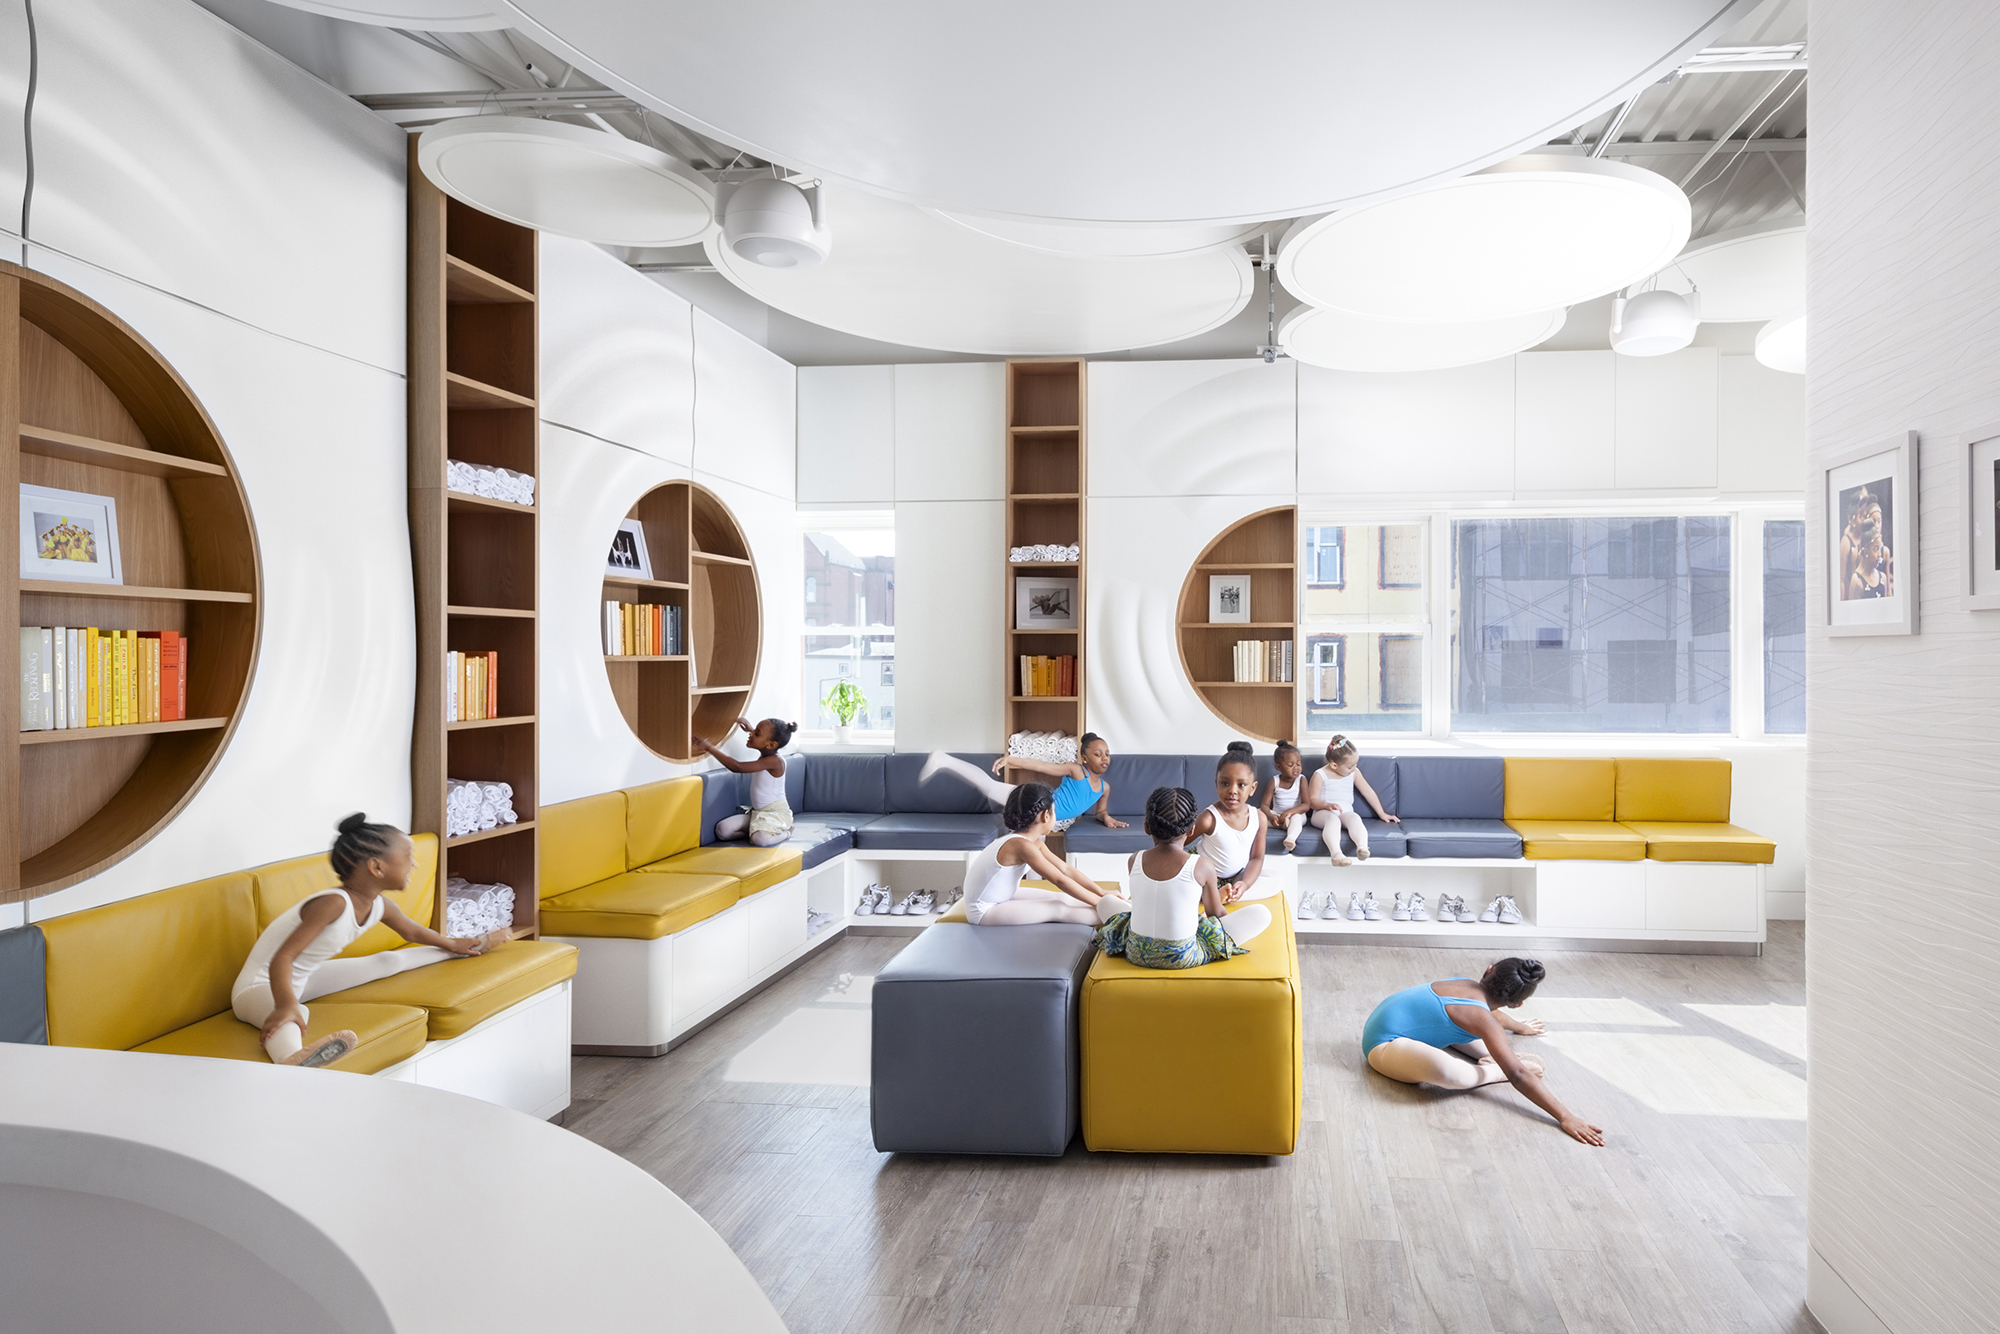 Aia new york announces 2017 design awards architect magazine awards award winners design for Art institute interior design reviews